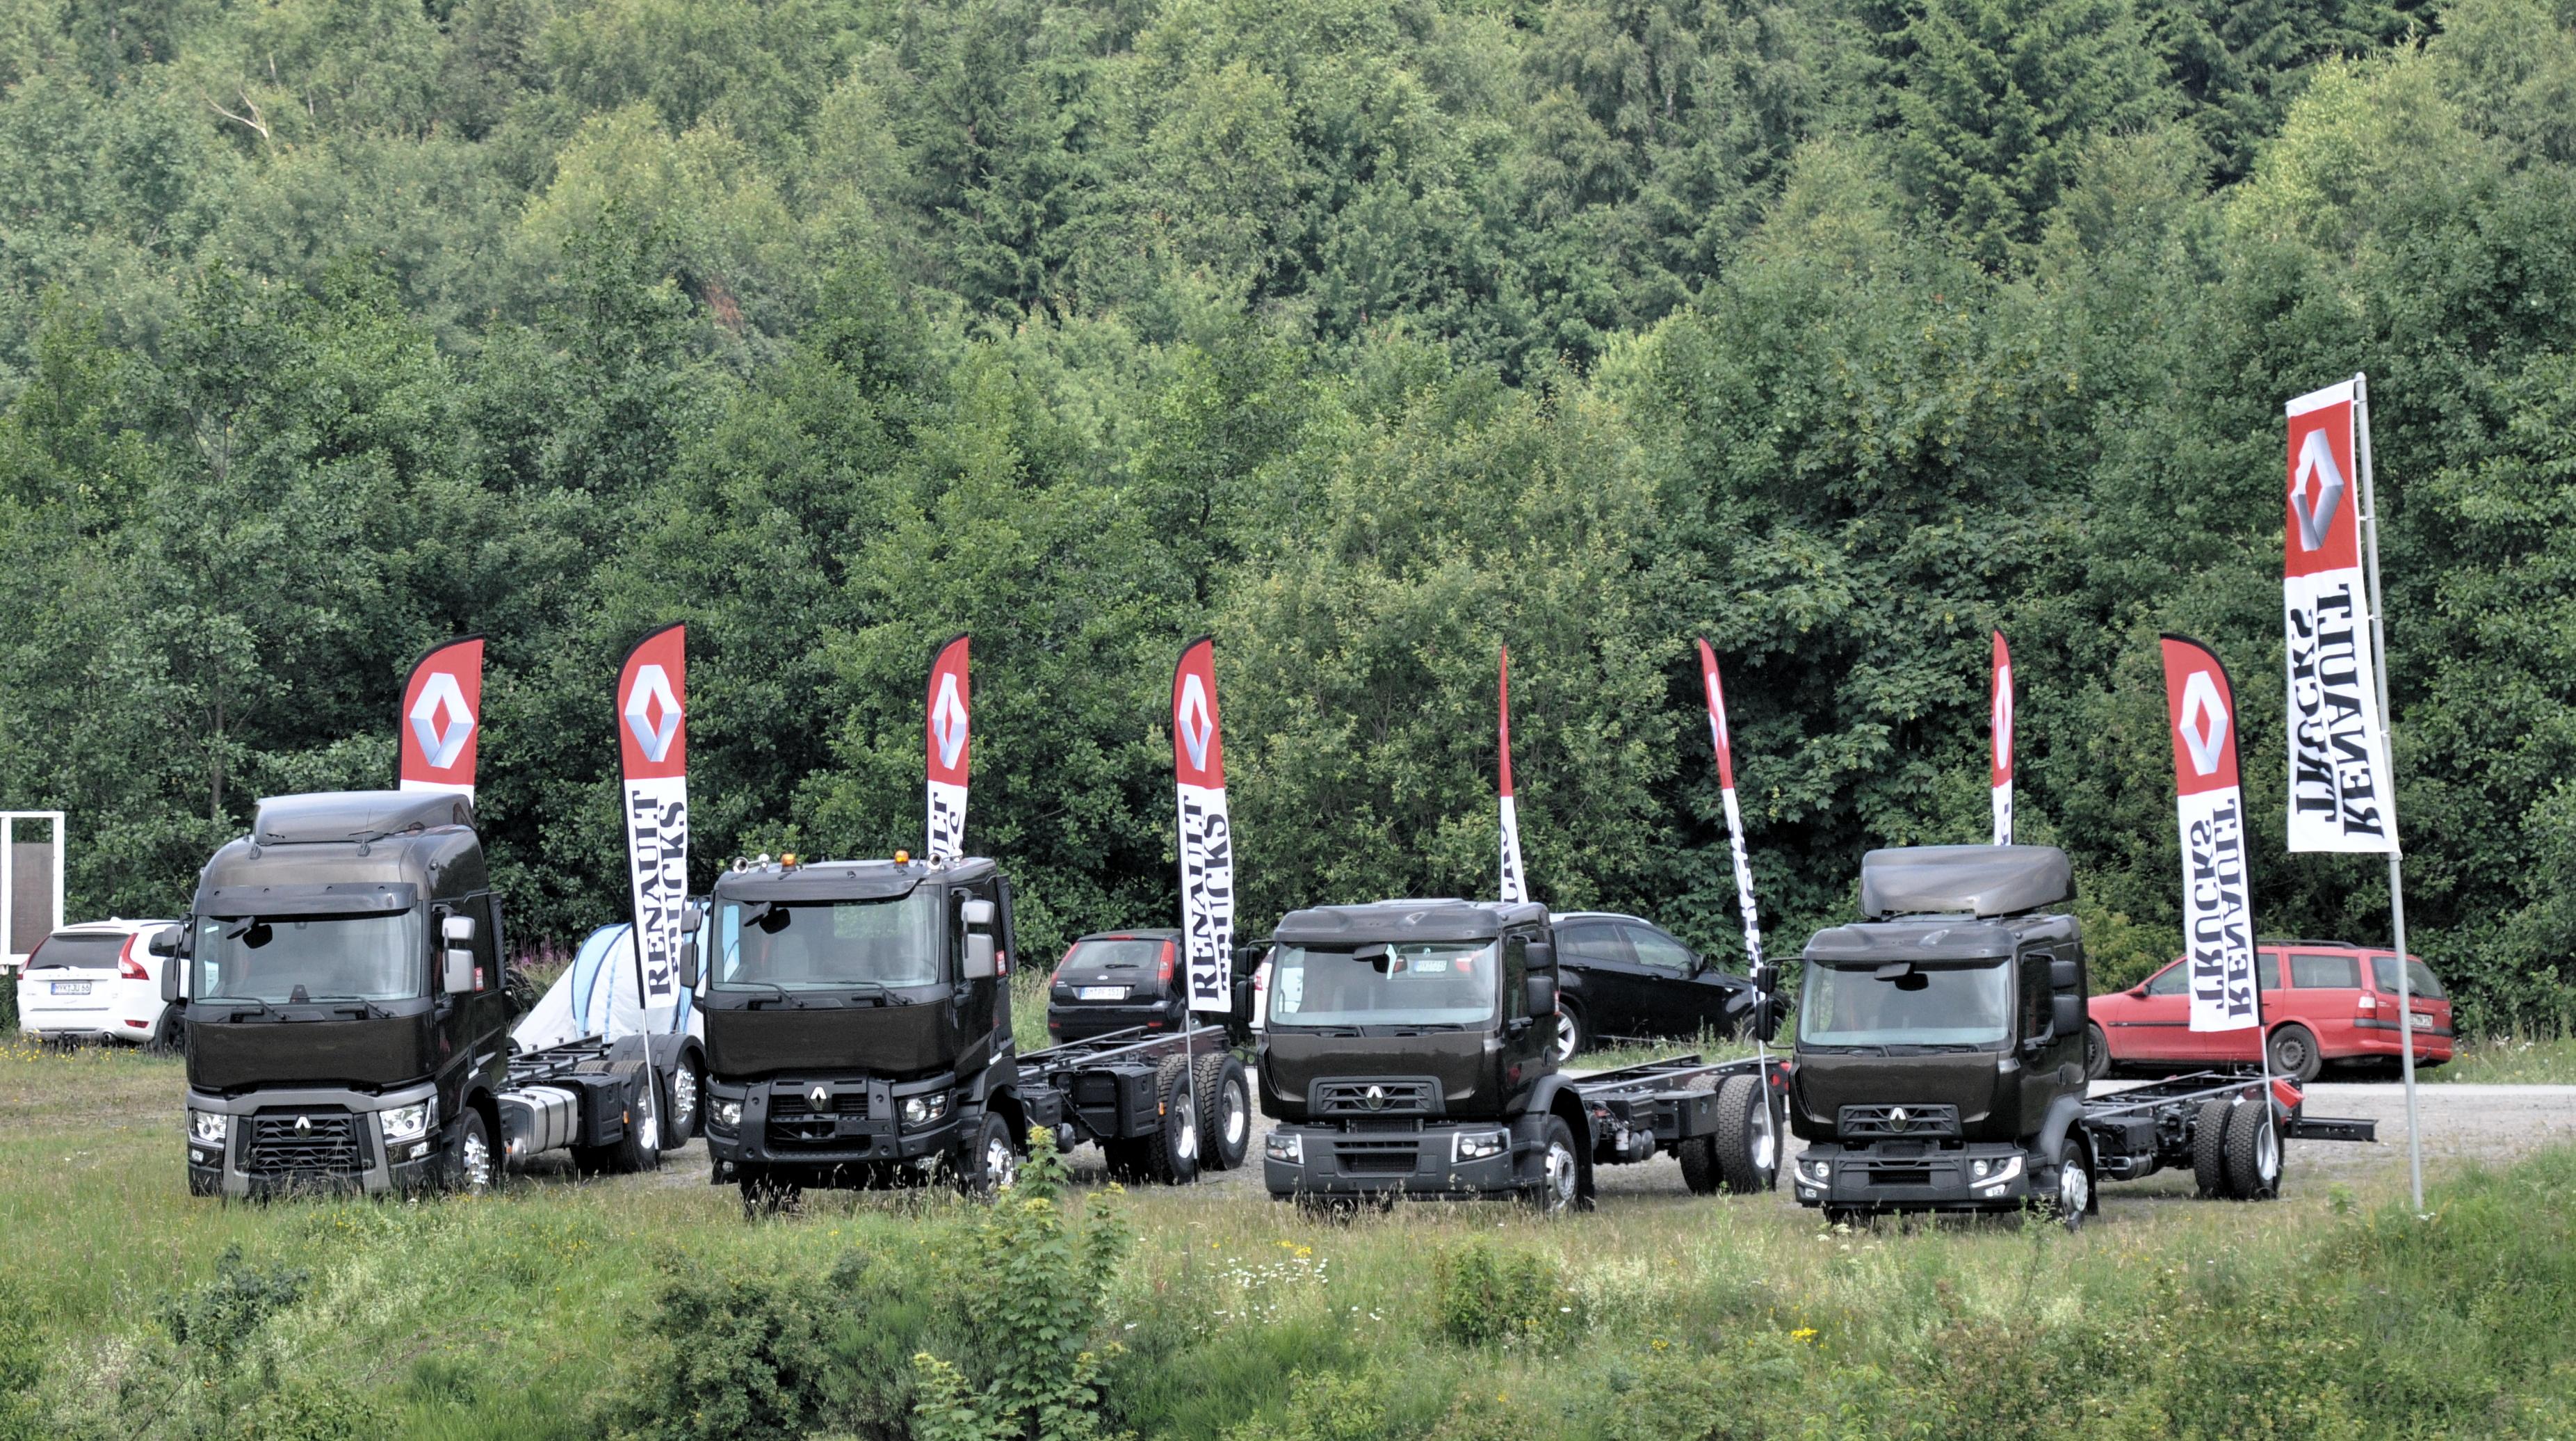 Datei:13-07-13 ADAC Truck GP 07.jpg – Wikipedia